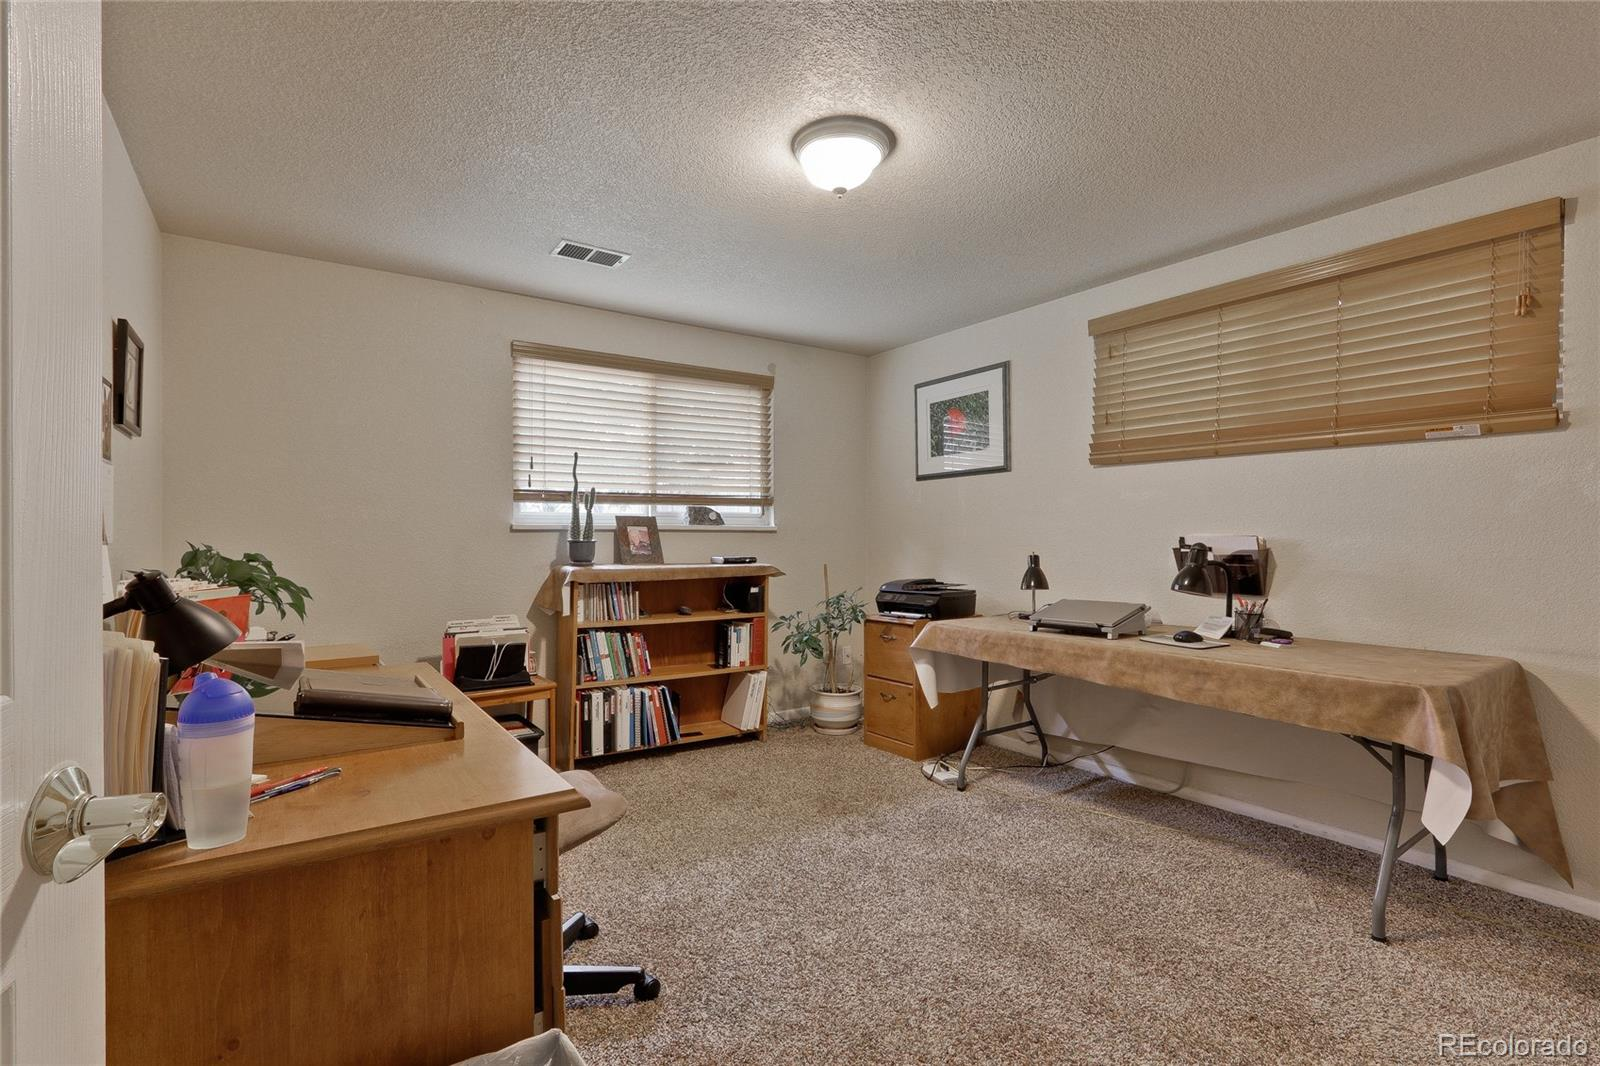 MLS# 6751608 - 24 - 12838 W Arizona Place, Lakewood, CO 80228